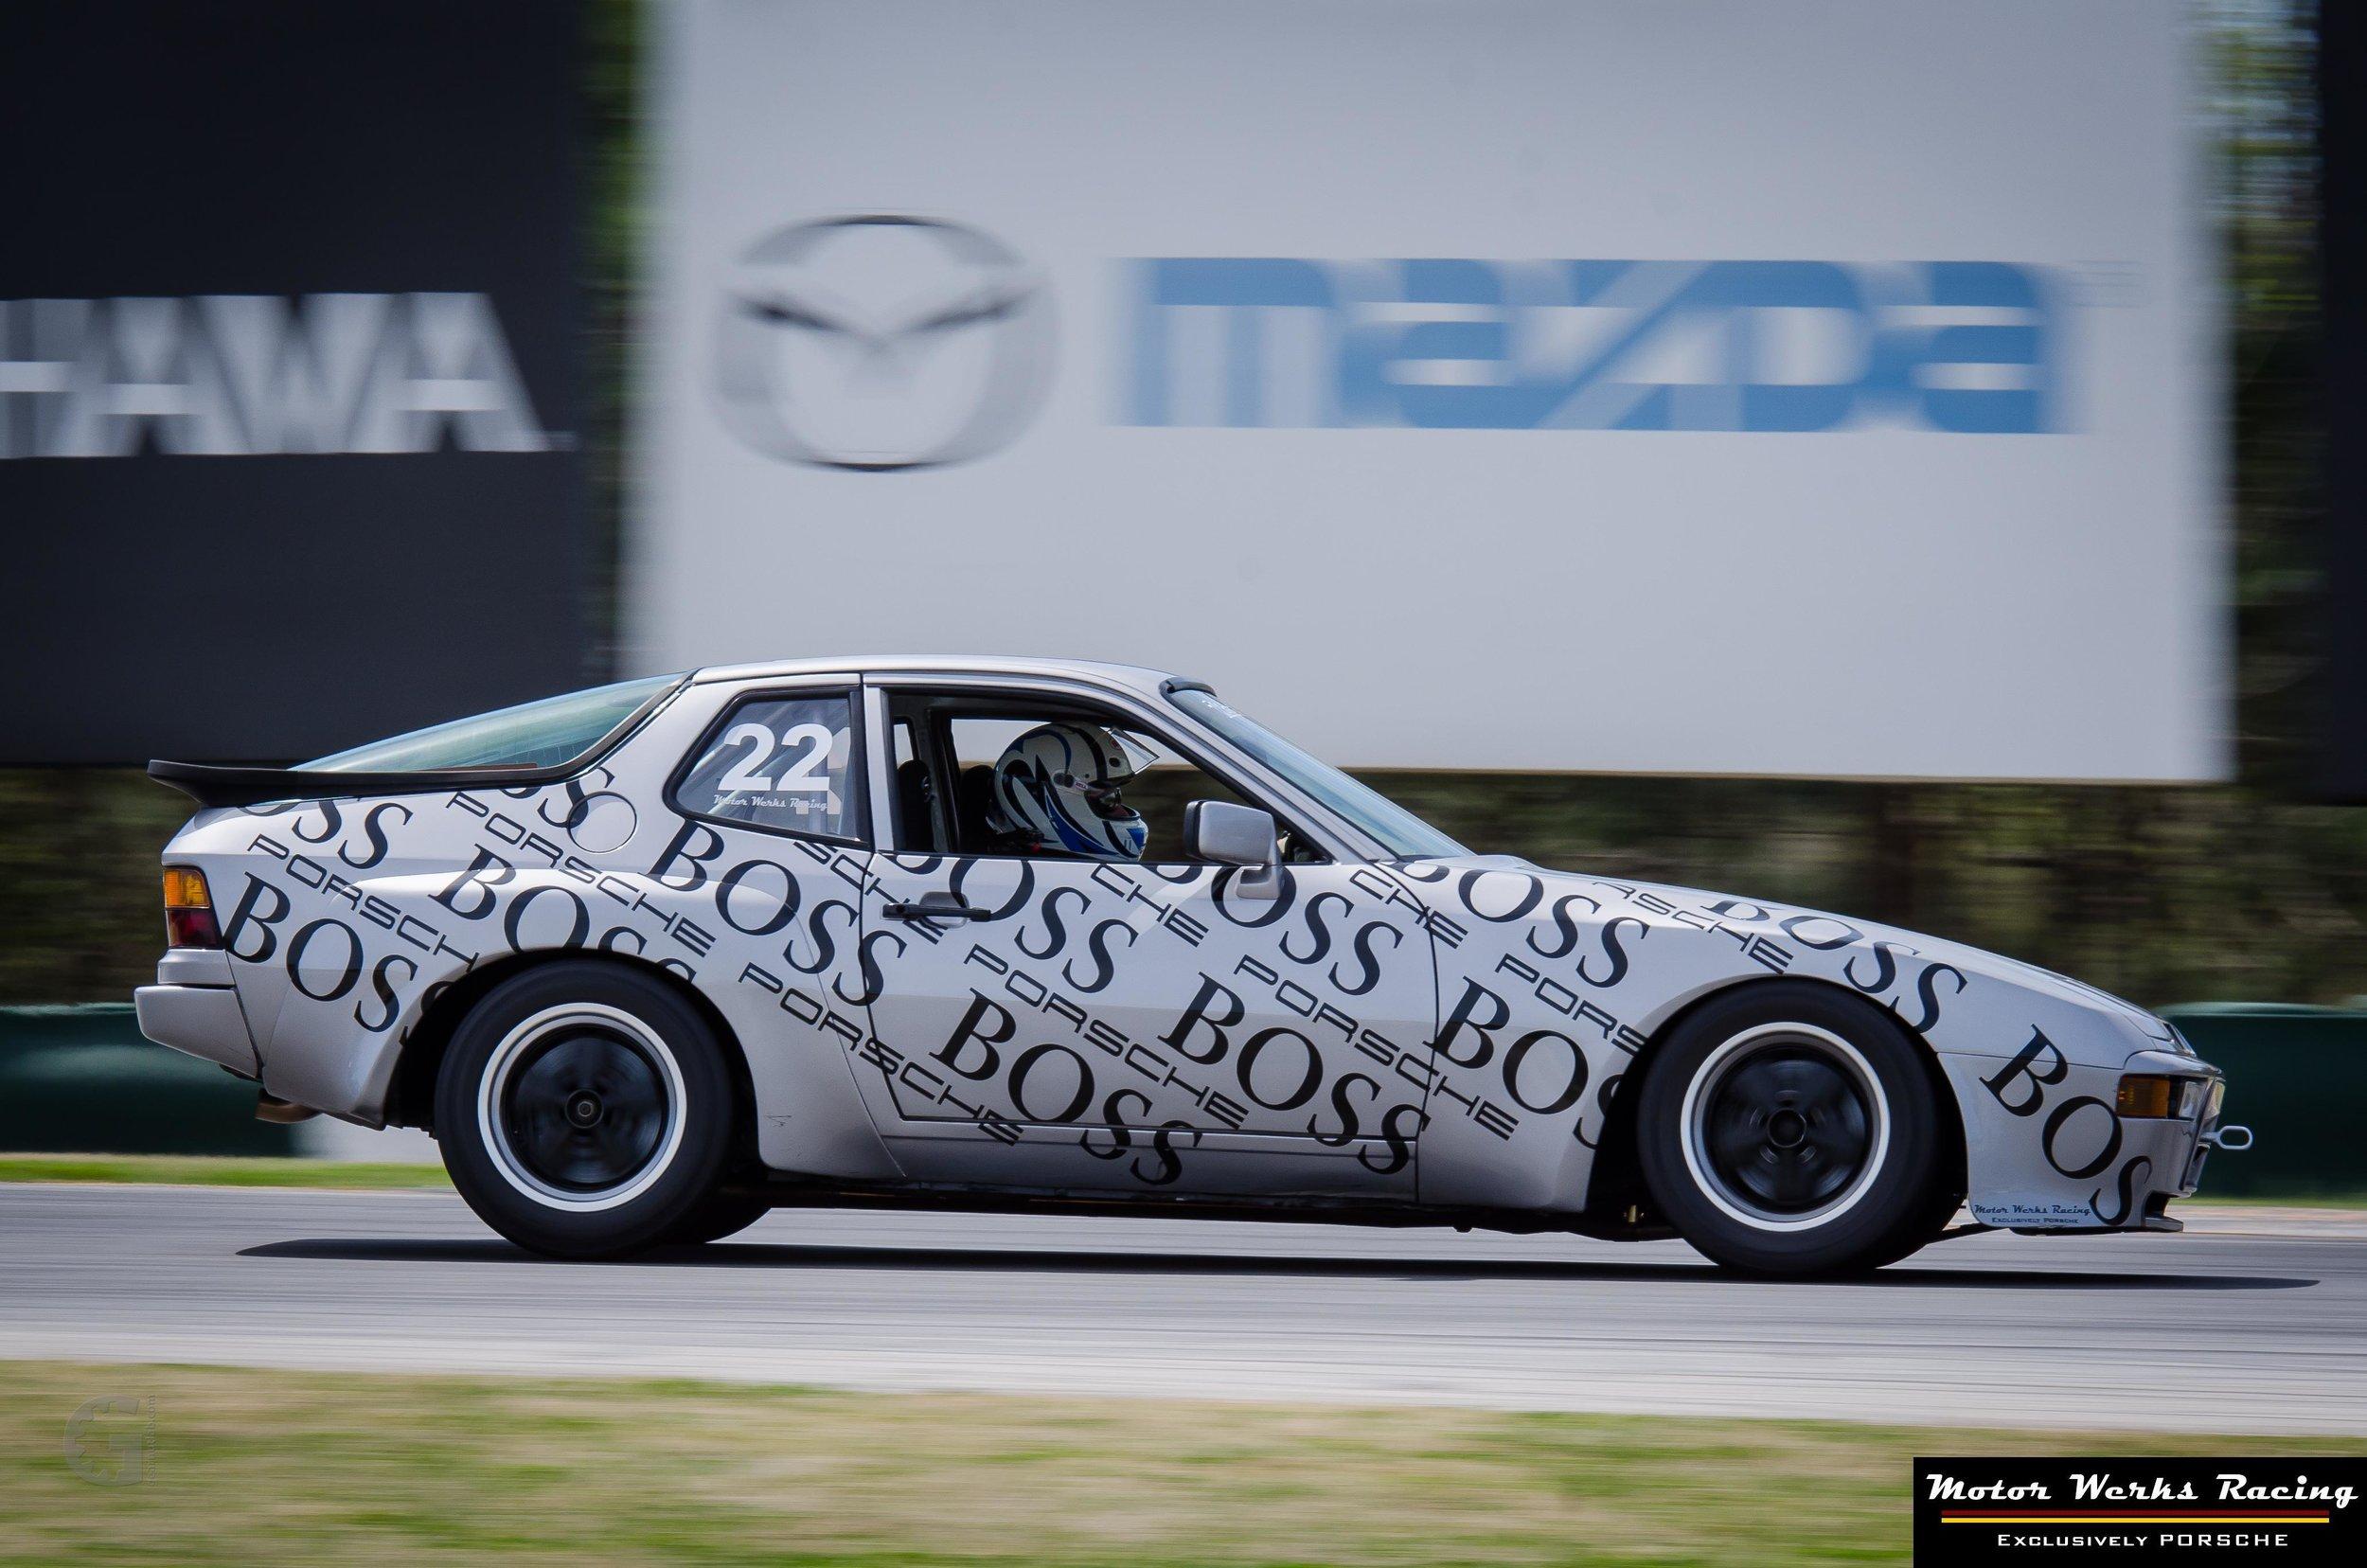 Motor Werks Racing Built To Order Track Cars